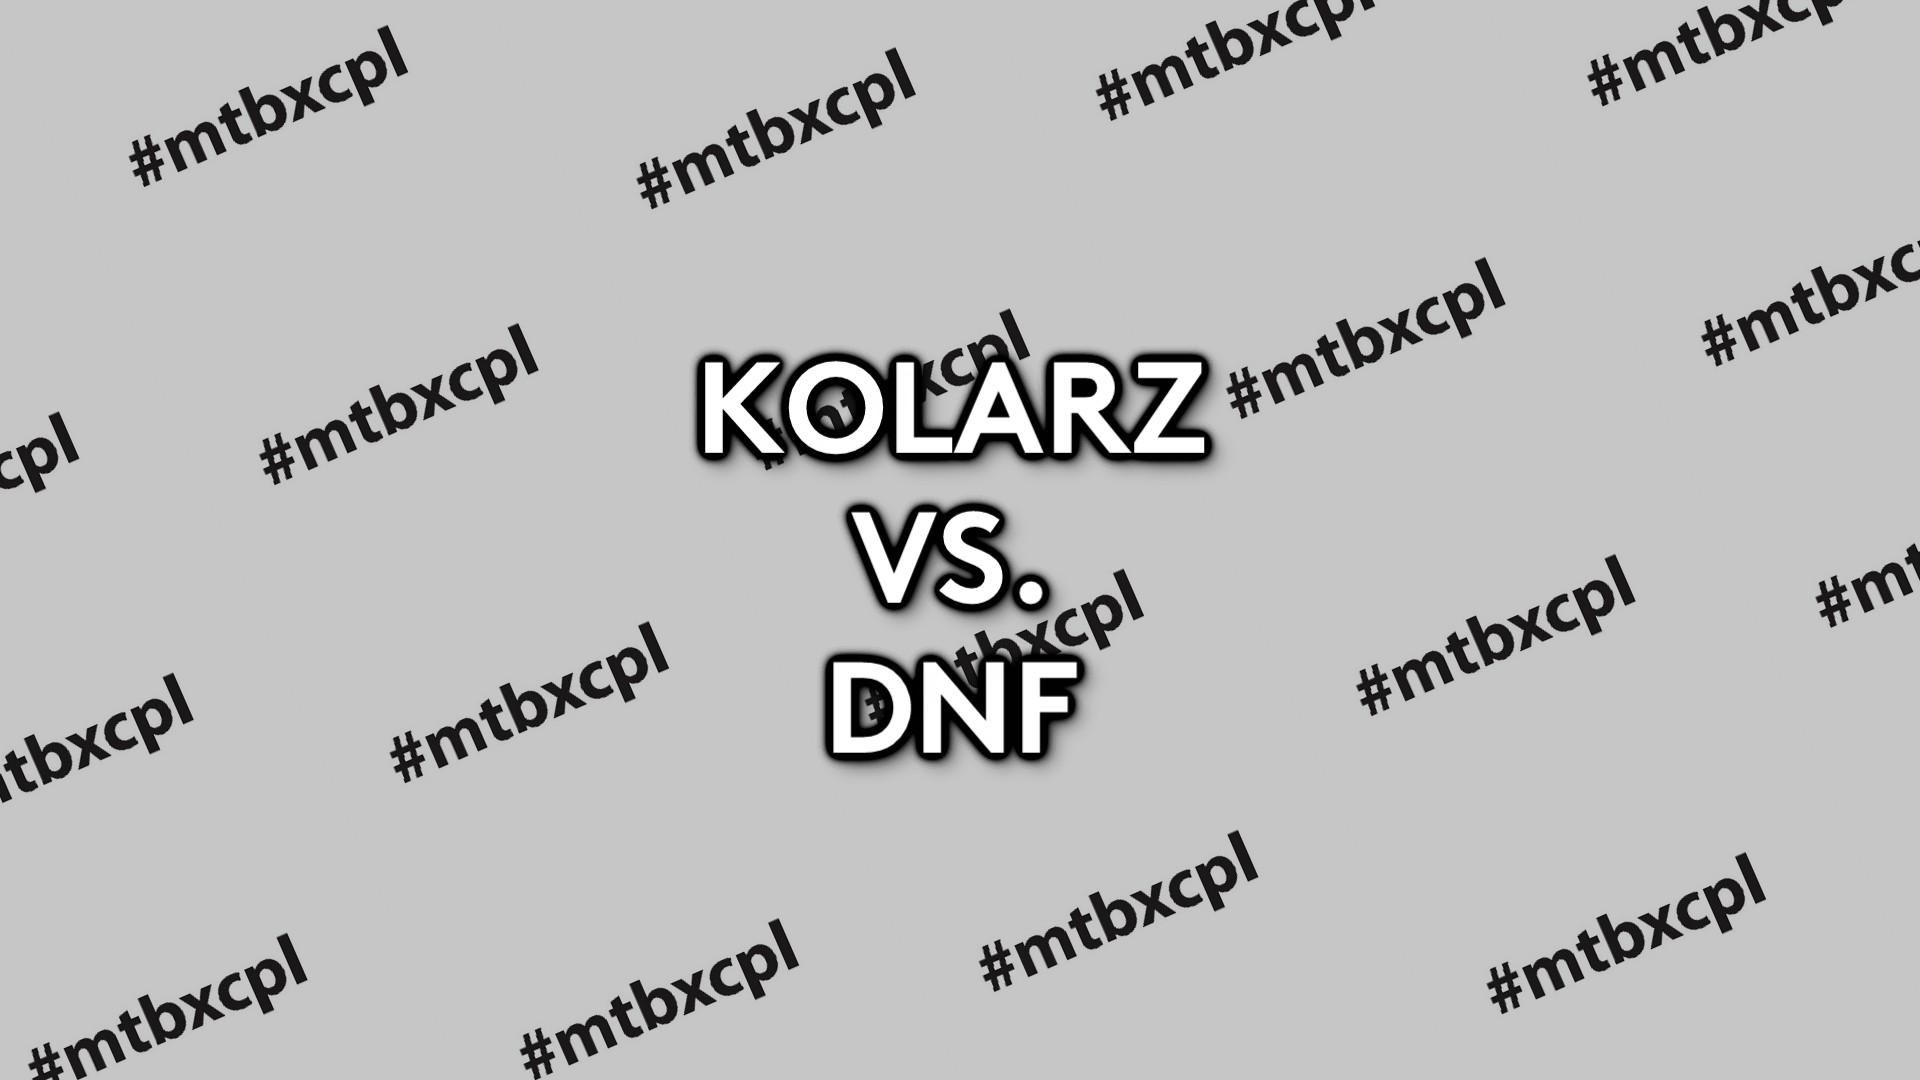 KOLARZ VS. DNF